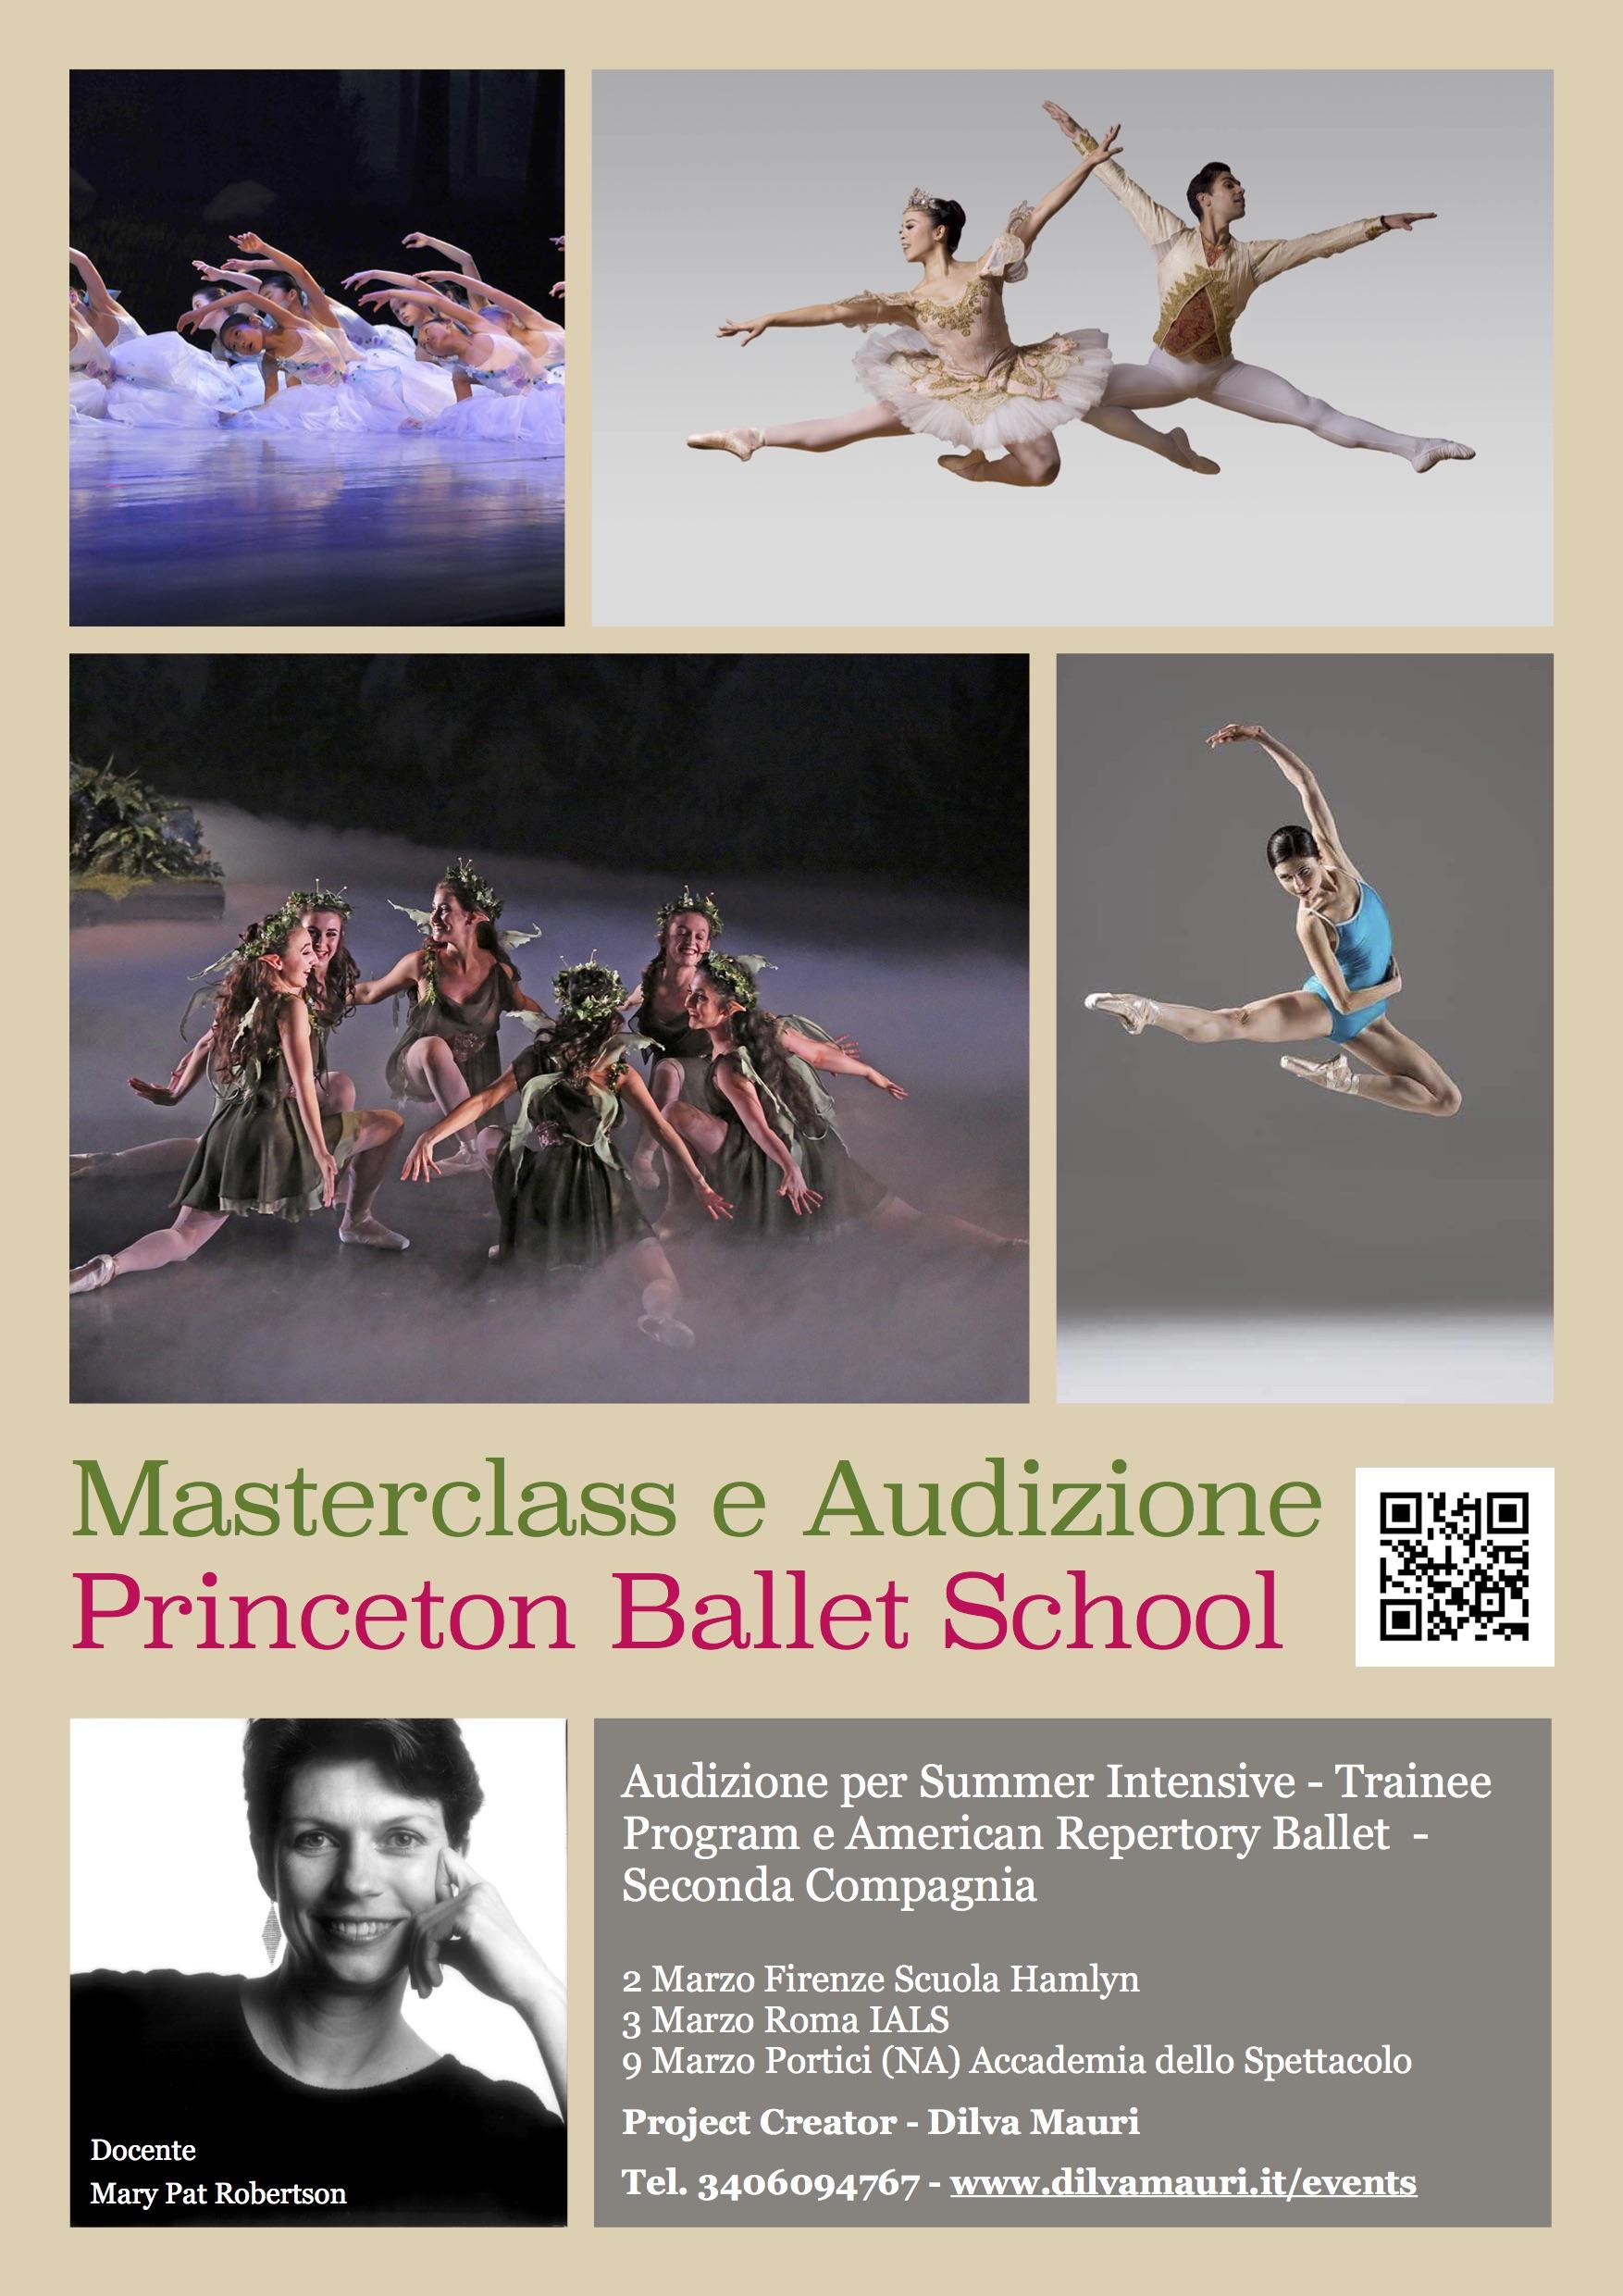 Masterclass Audizione Princeton Ballet School 2019